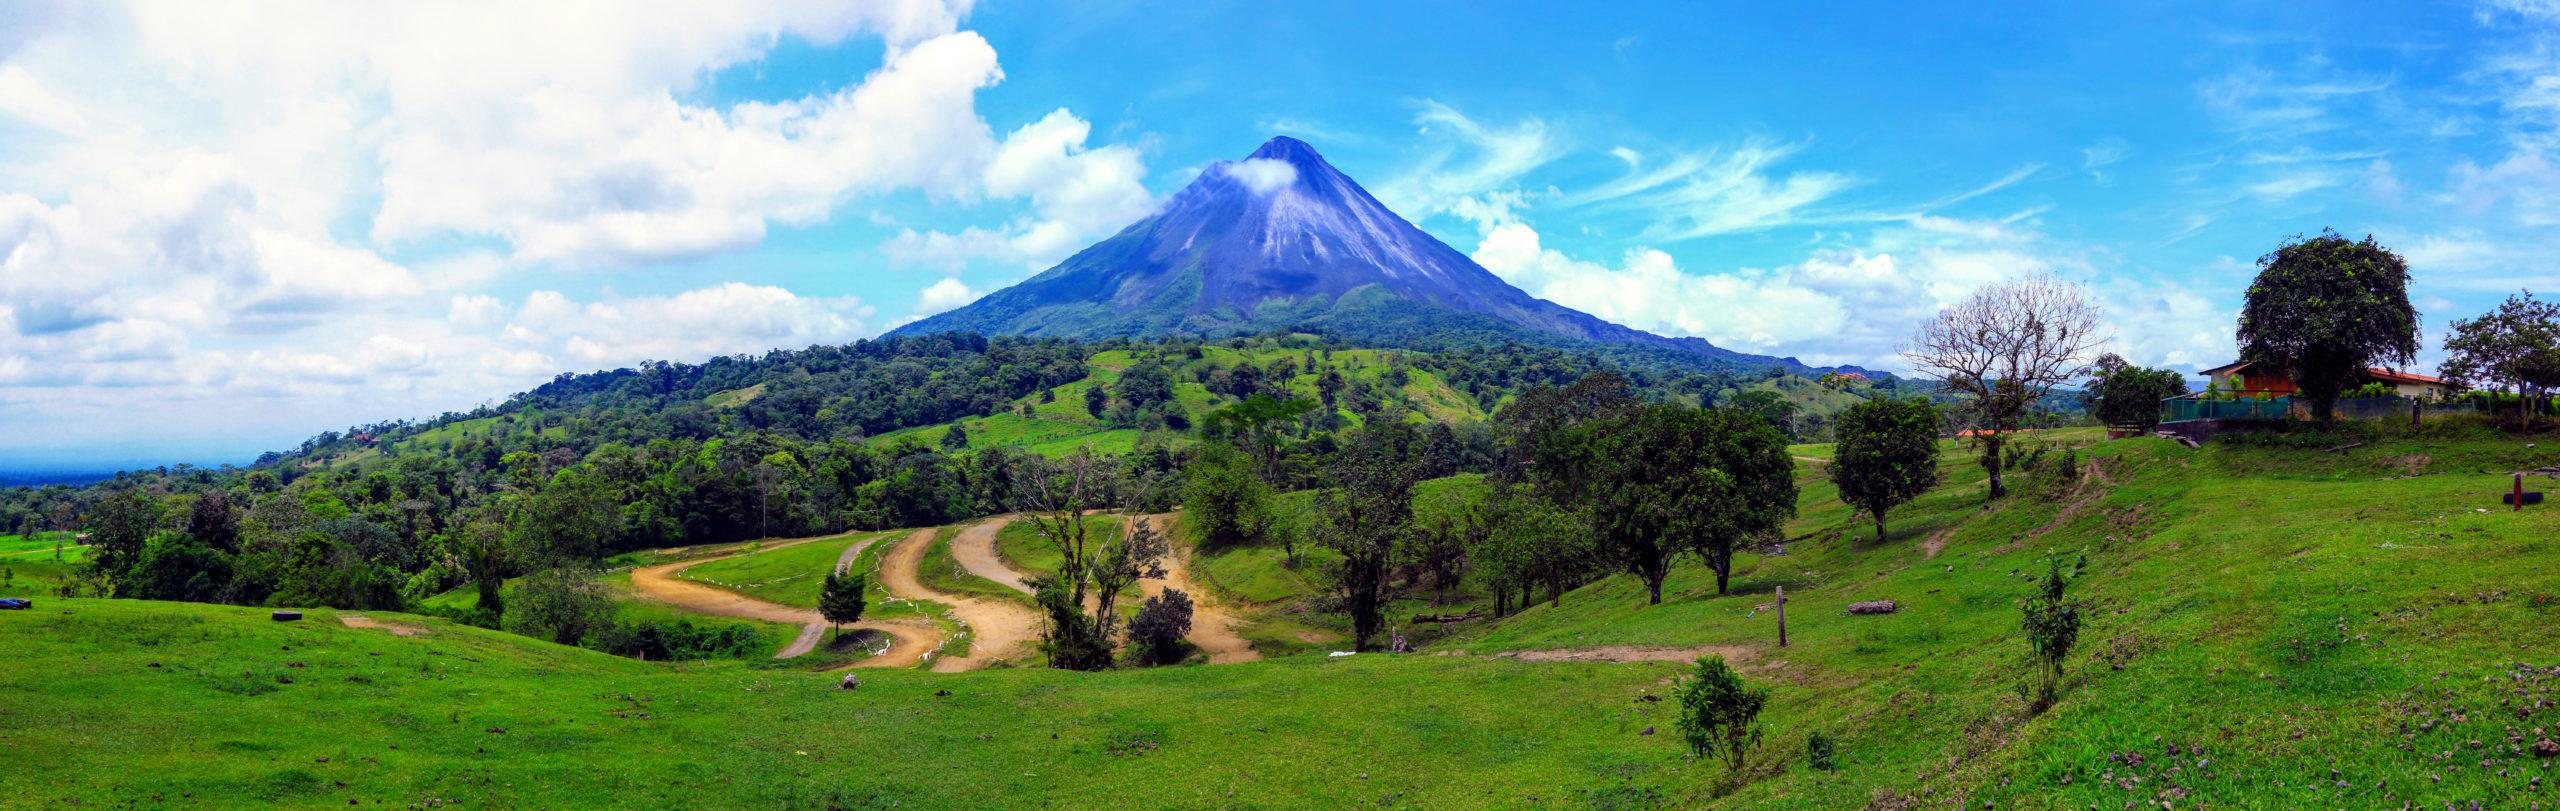 Simply Costa Rica